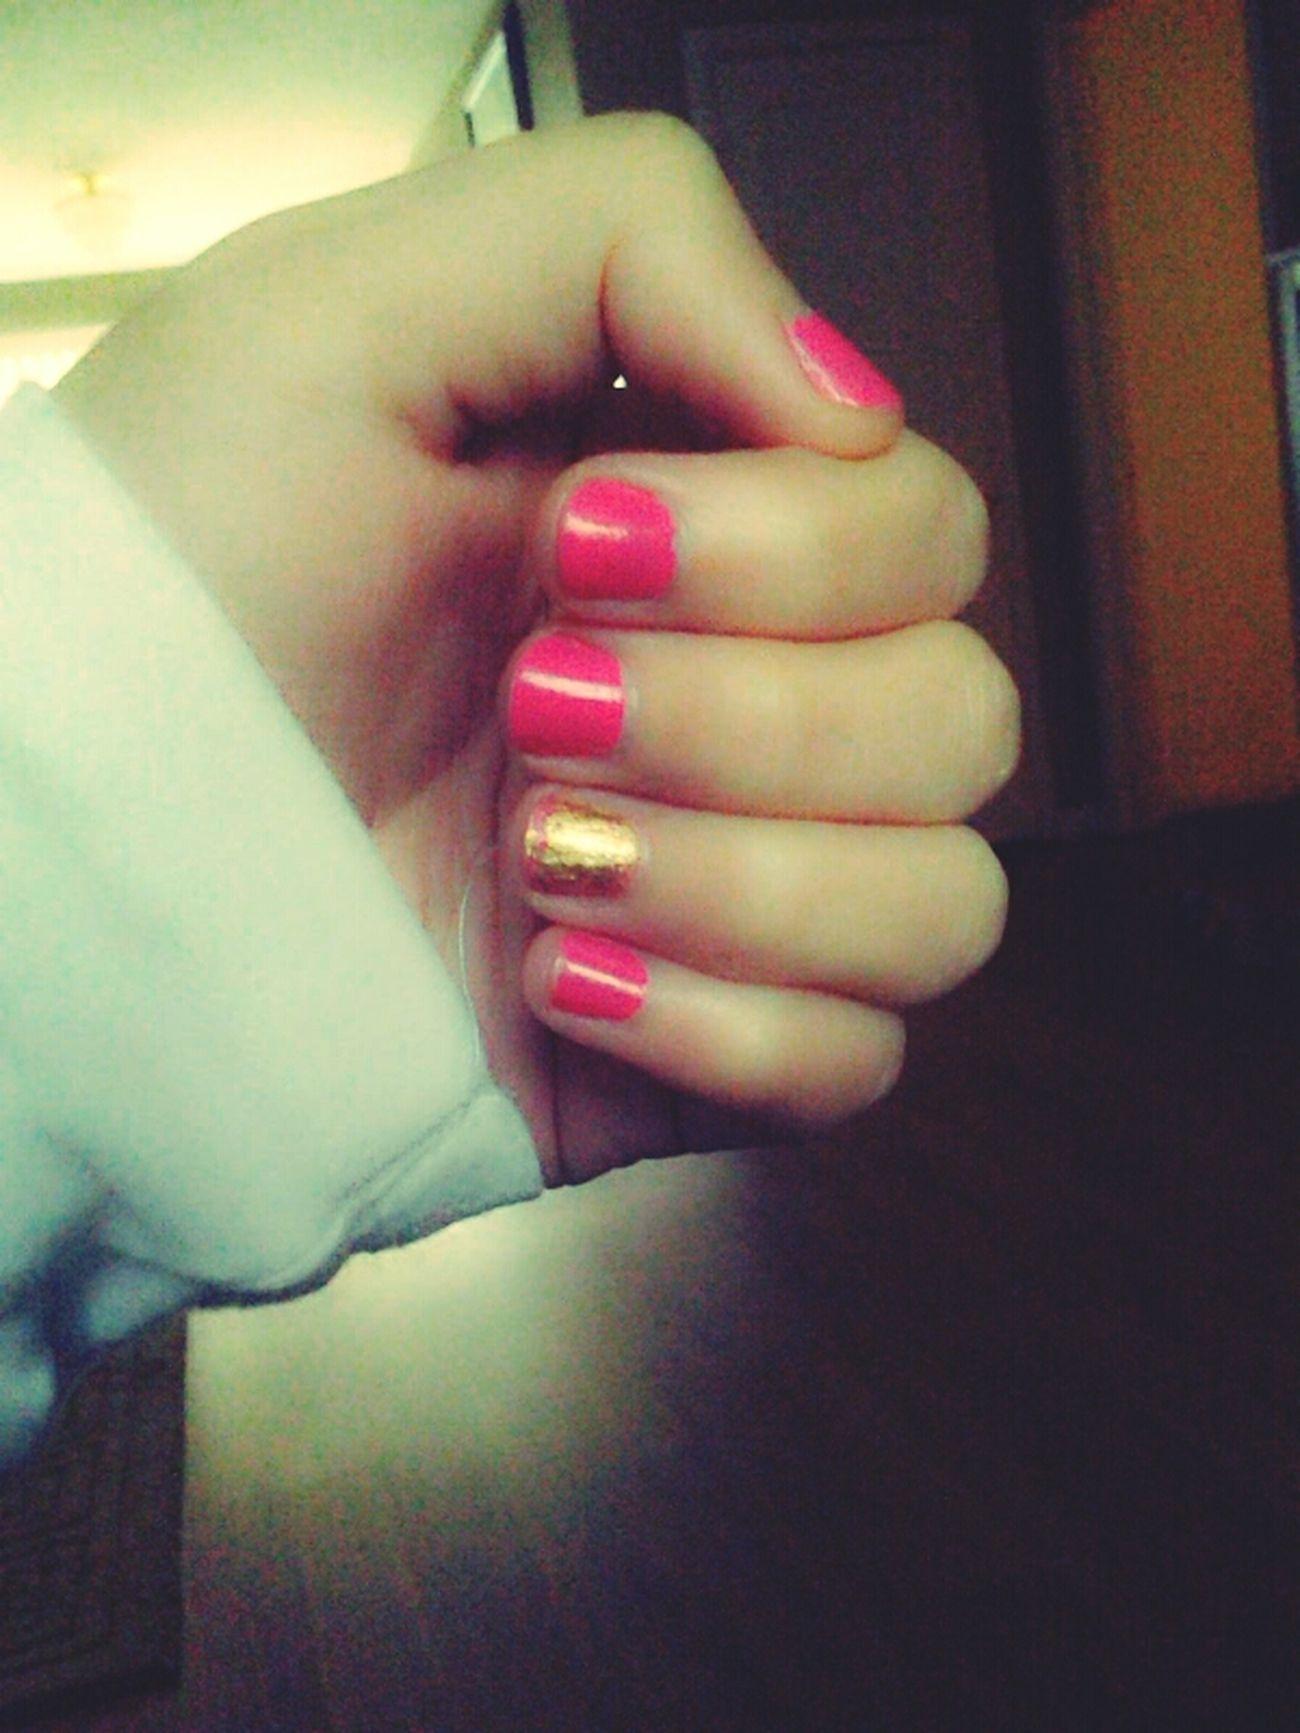 My Cute Nails Lol C: